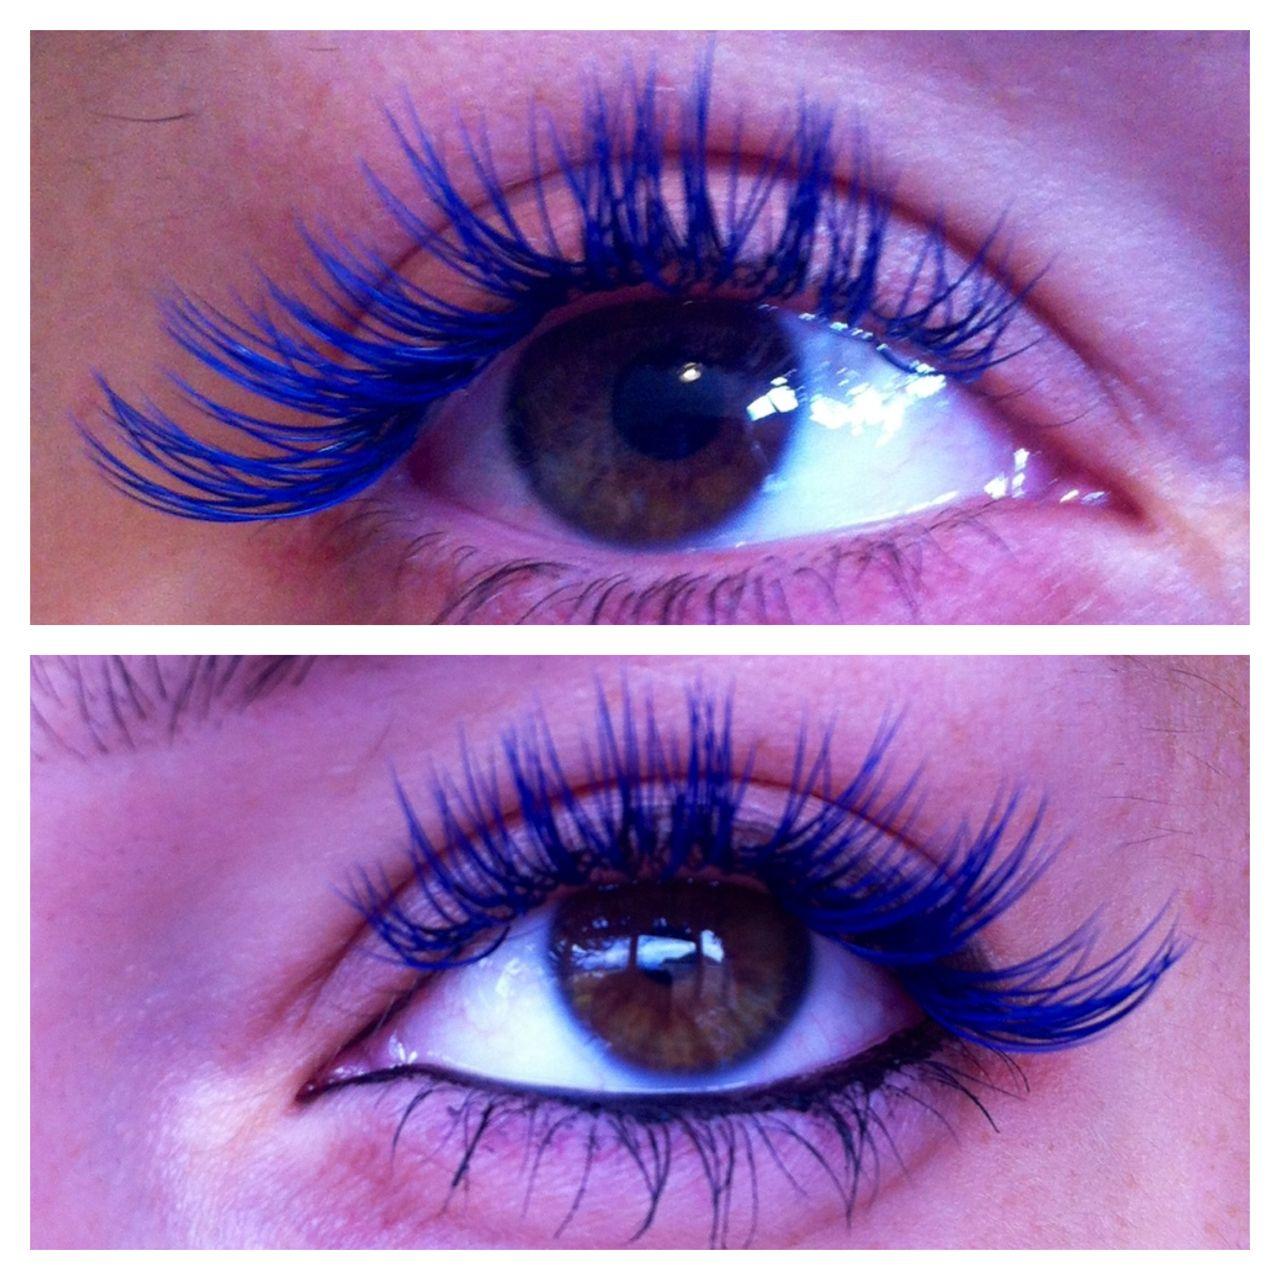 Blue semi permanent eyelash extensions http://www.facebook.com ...